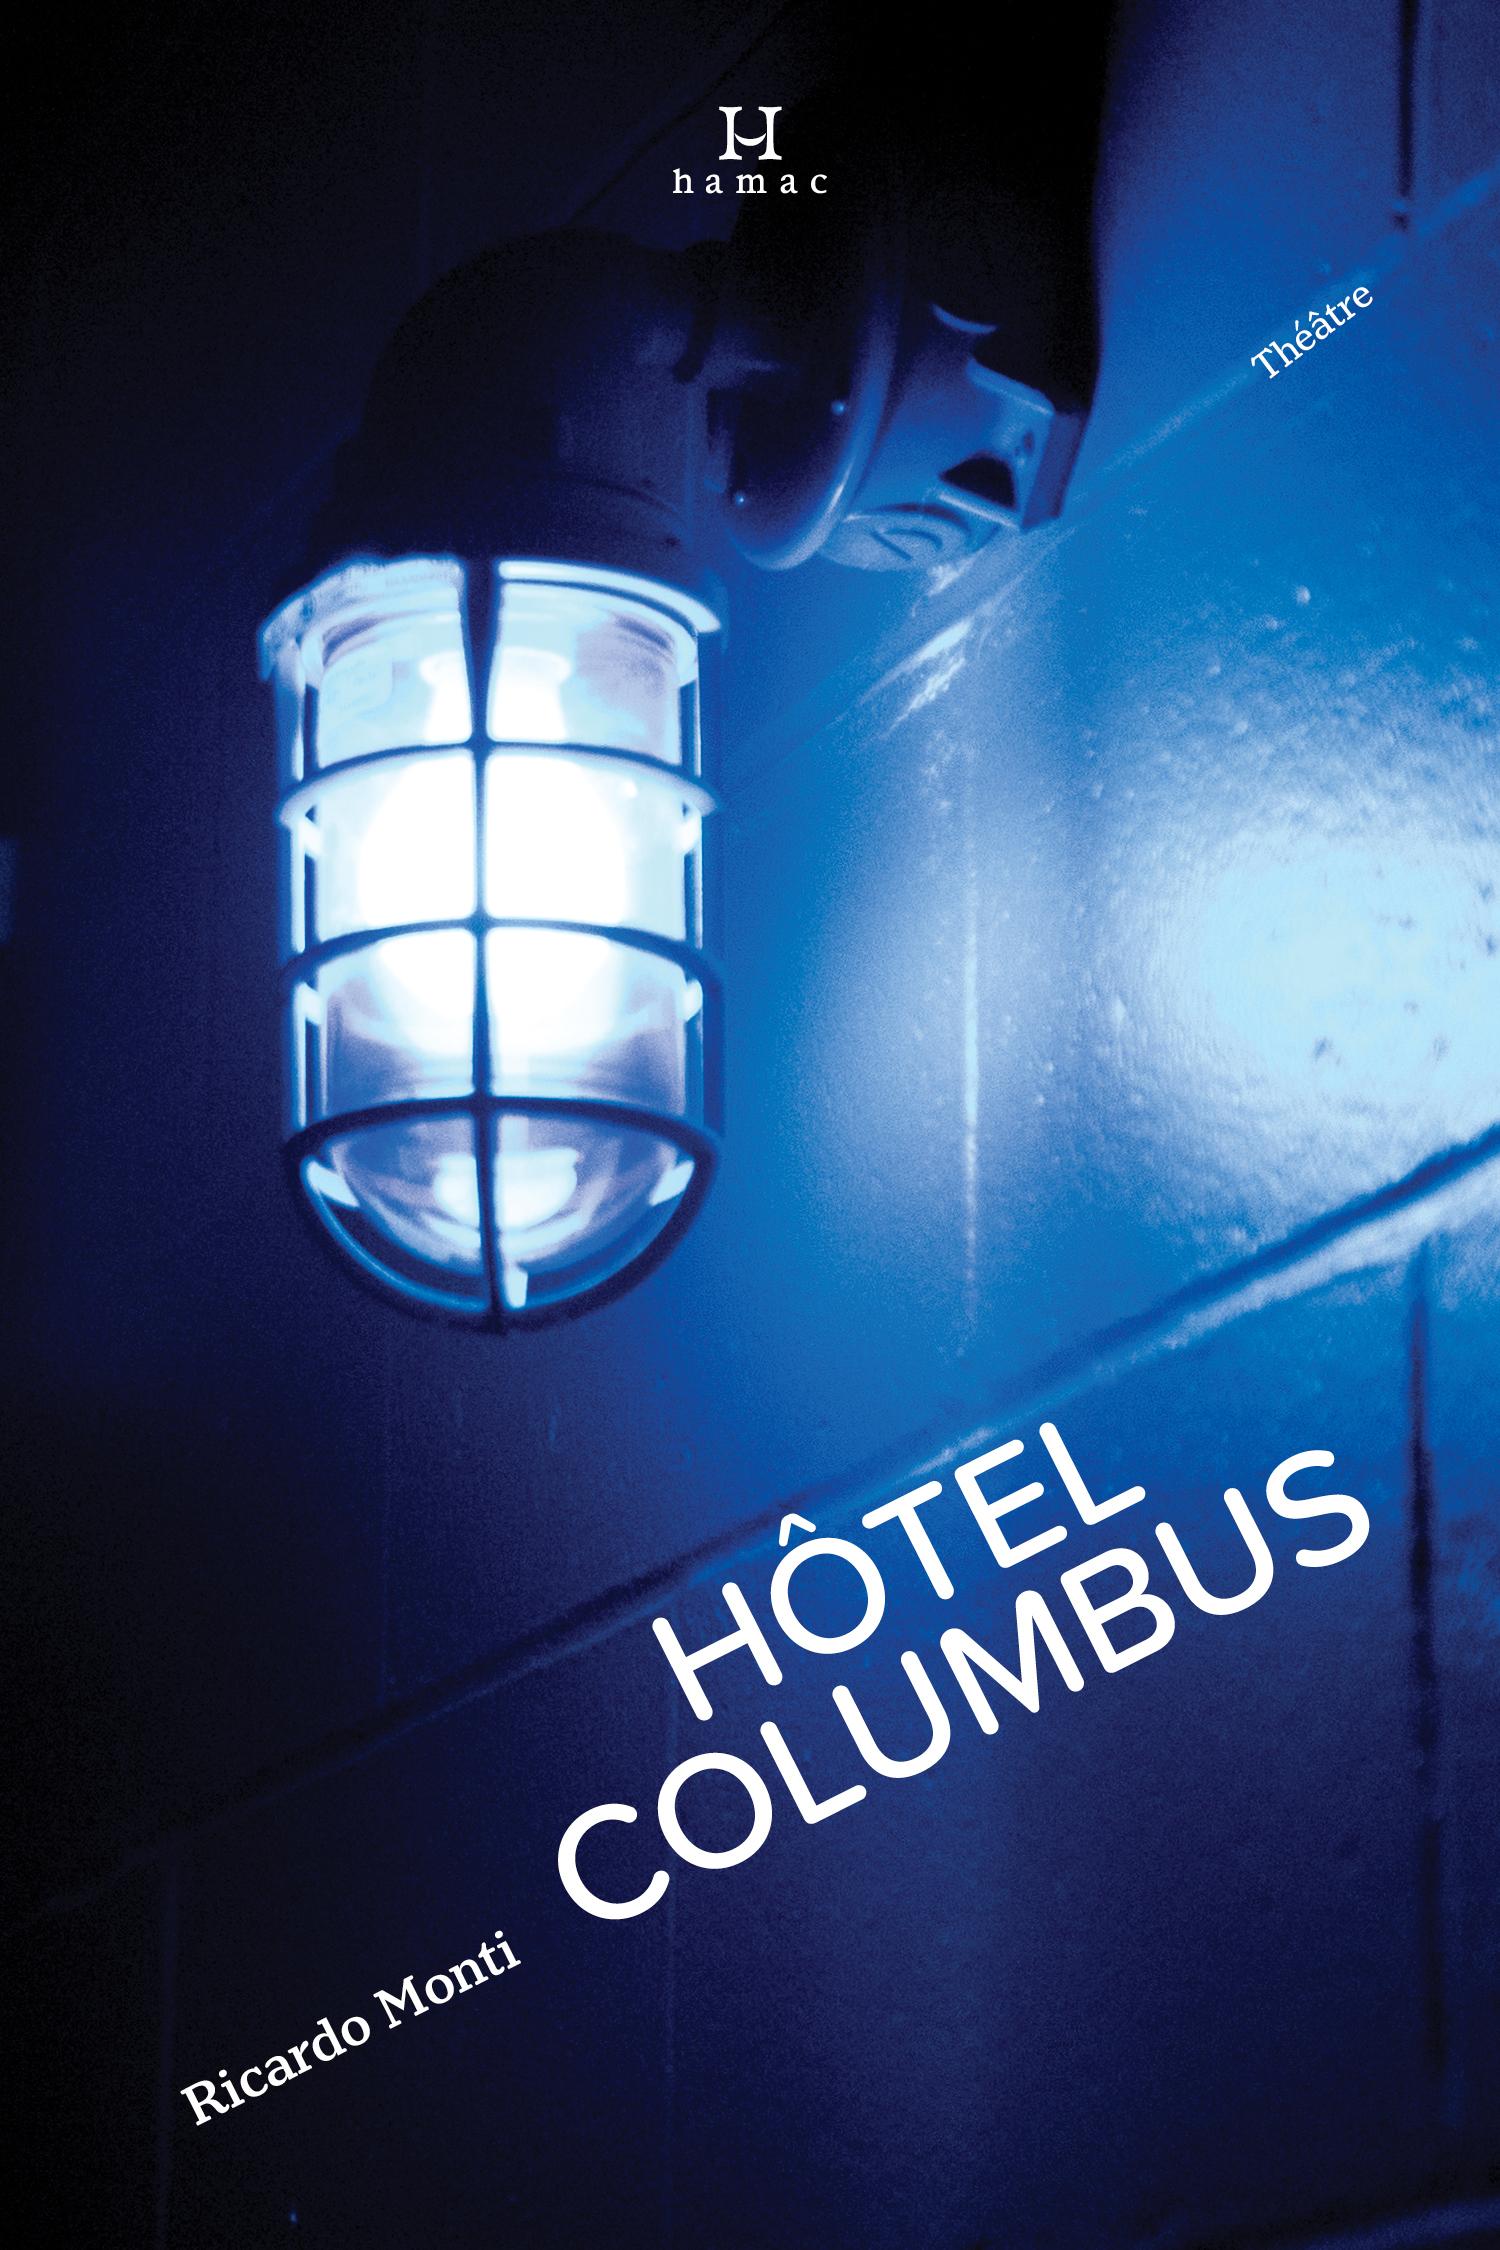 Hôtel Columbus